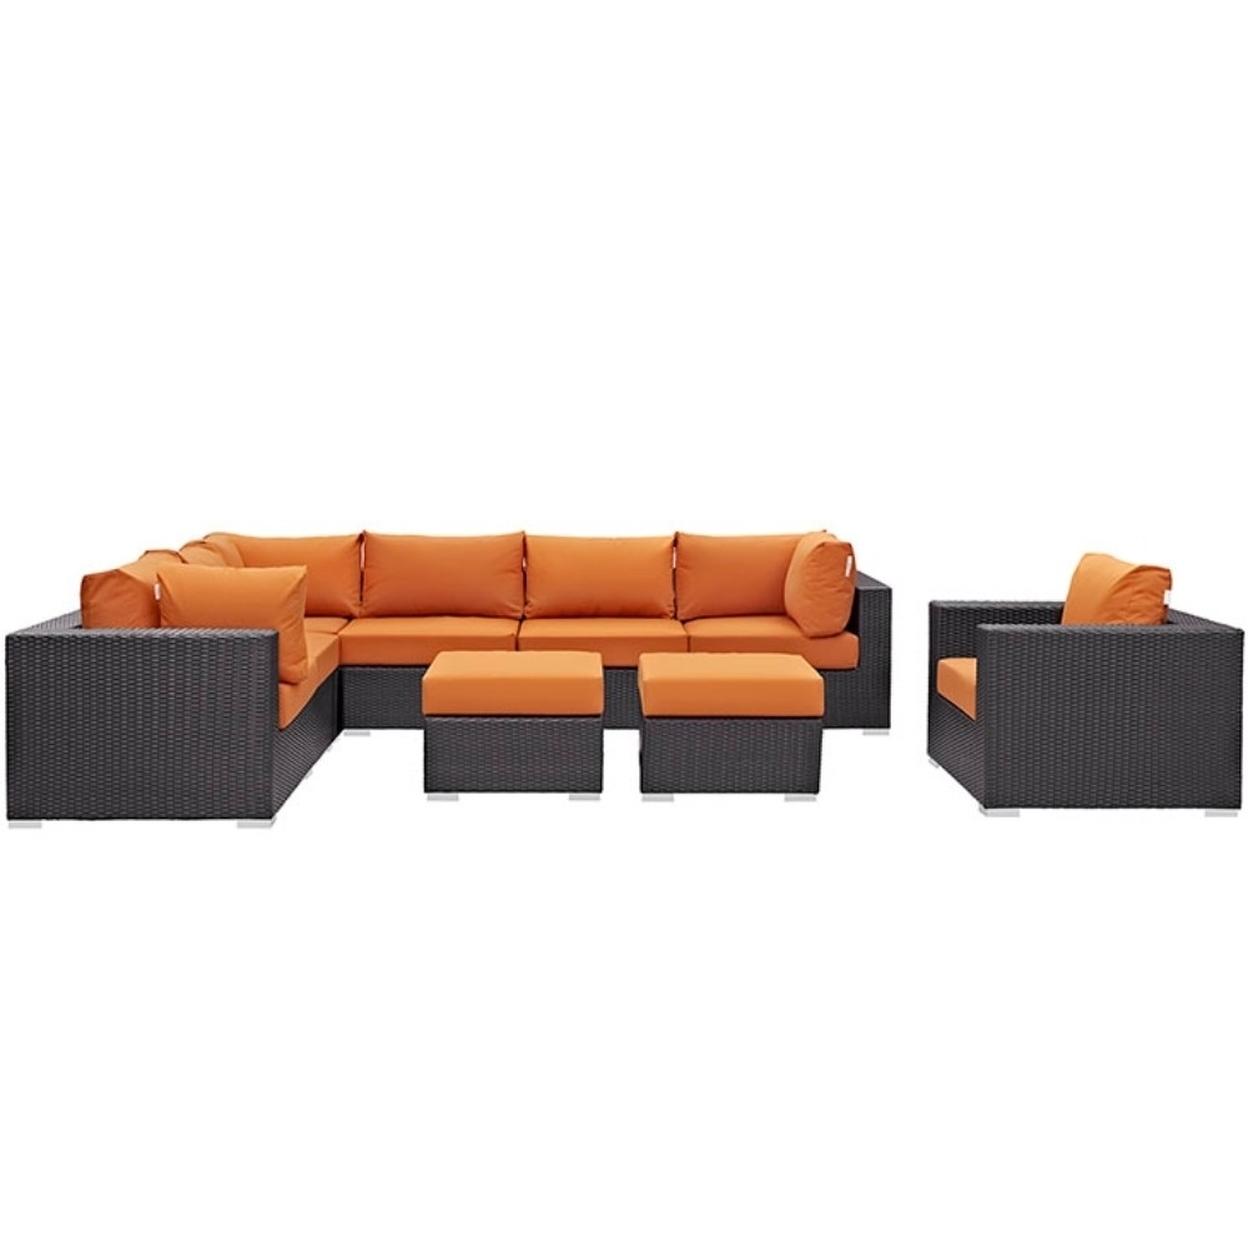 Convene 9 Piece Outdoor Patio Sectional Set, Espresso Orange 59a7a0d82a00e45d3605b1ff